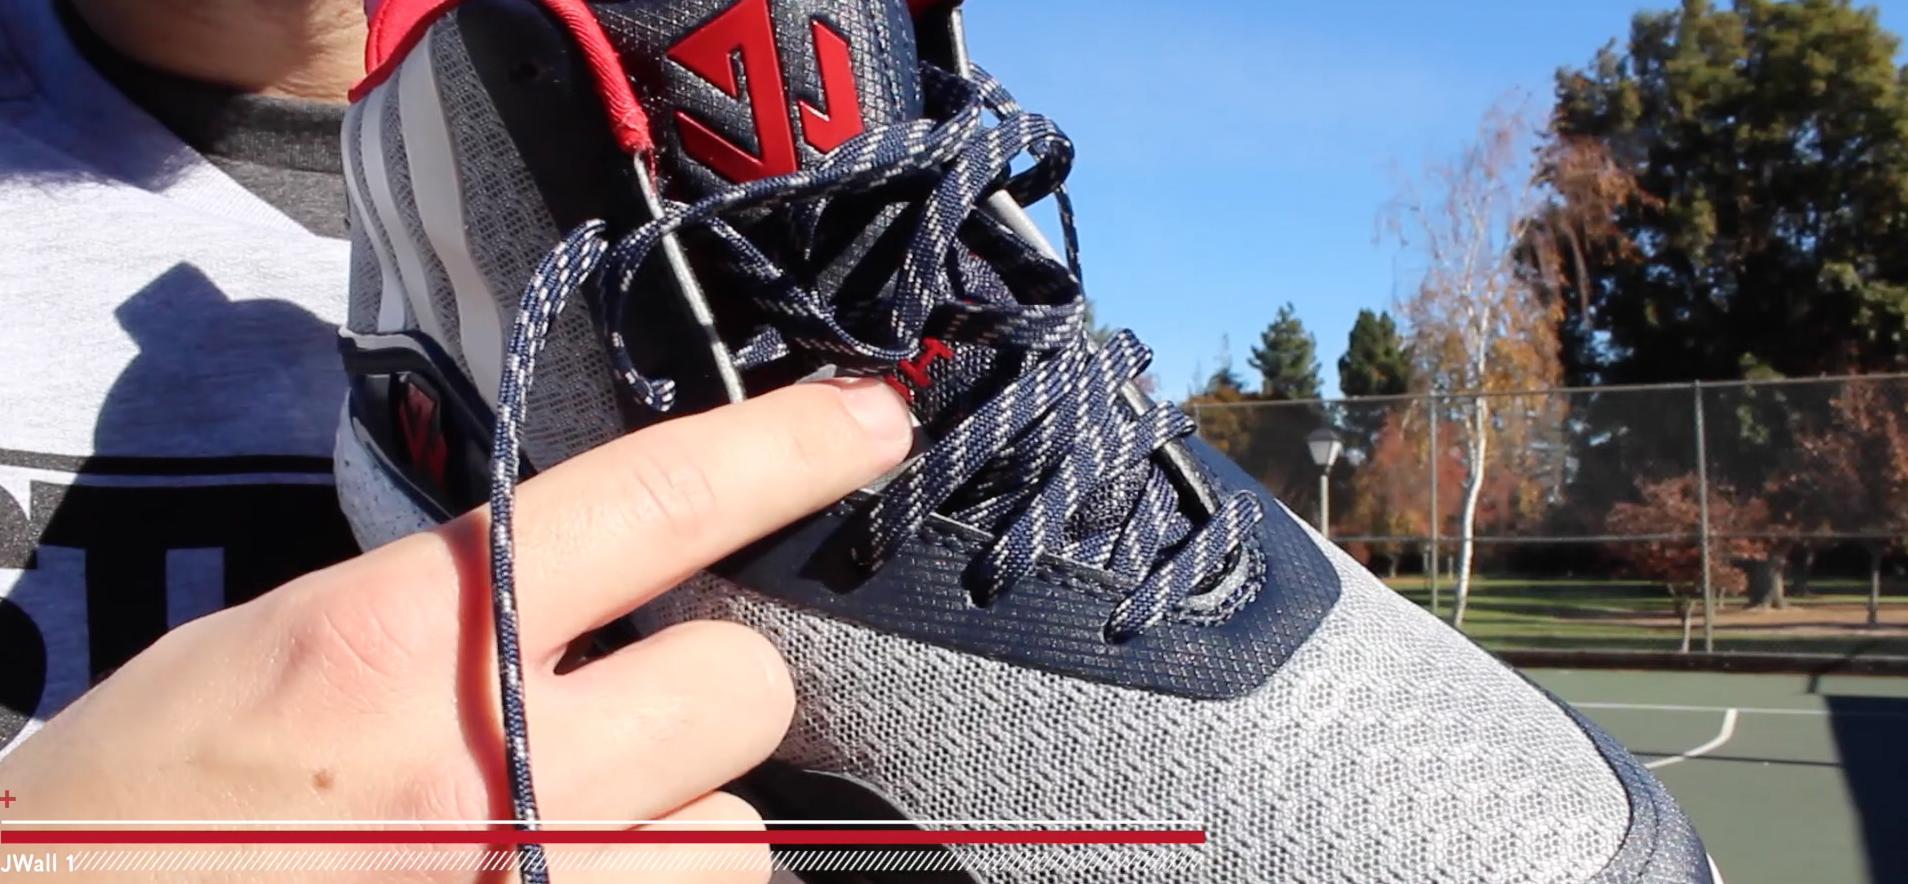 Damen Schuhe Sneaker adidas performance Conquisto II IN Indoor rotorange Synthetik (Gummi) ArtNr.: 07504000089